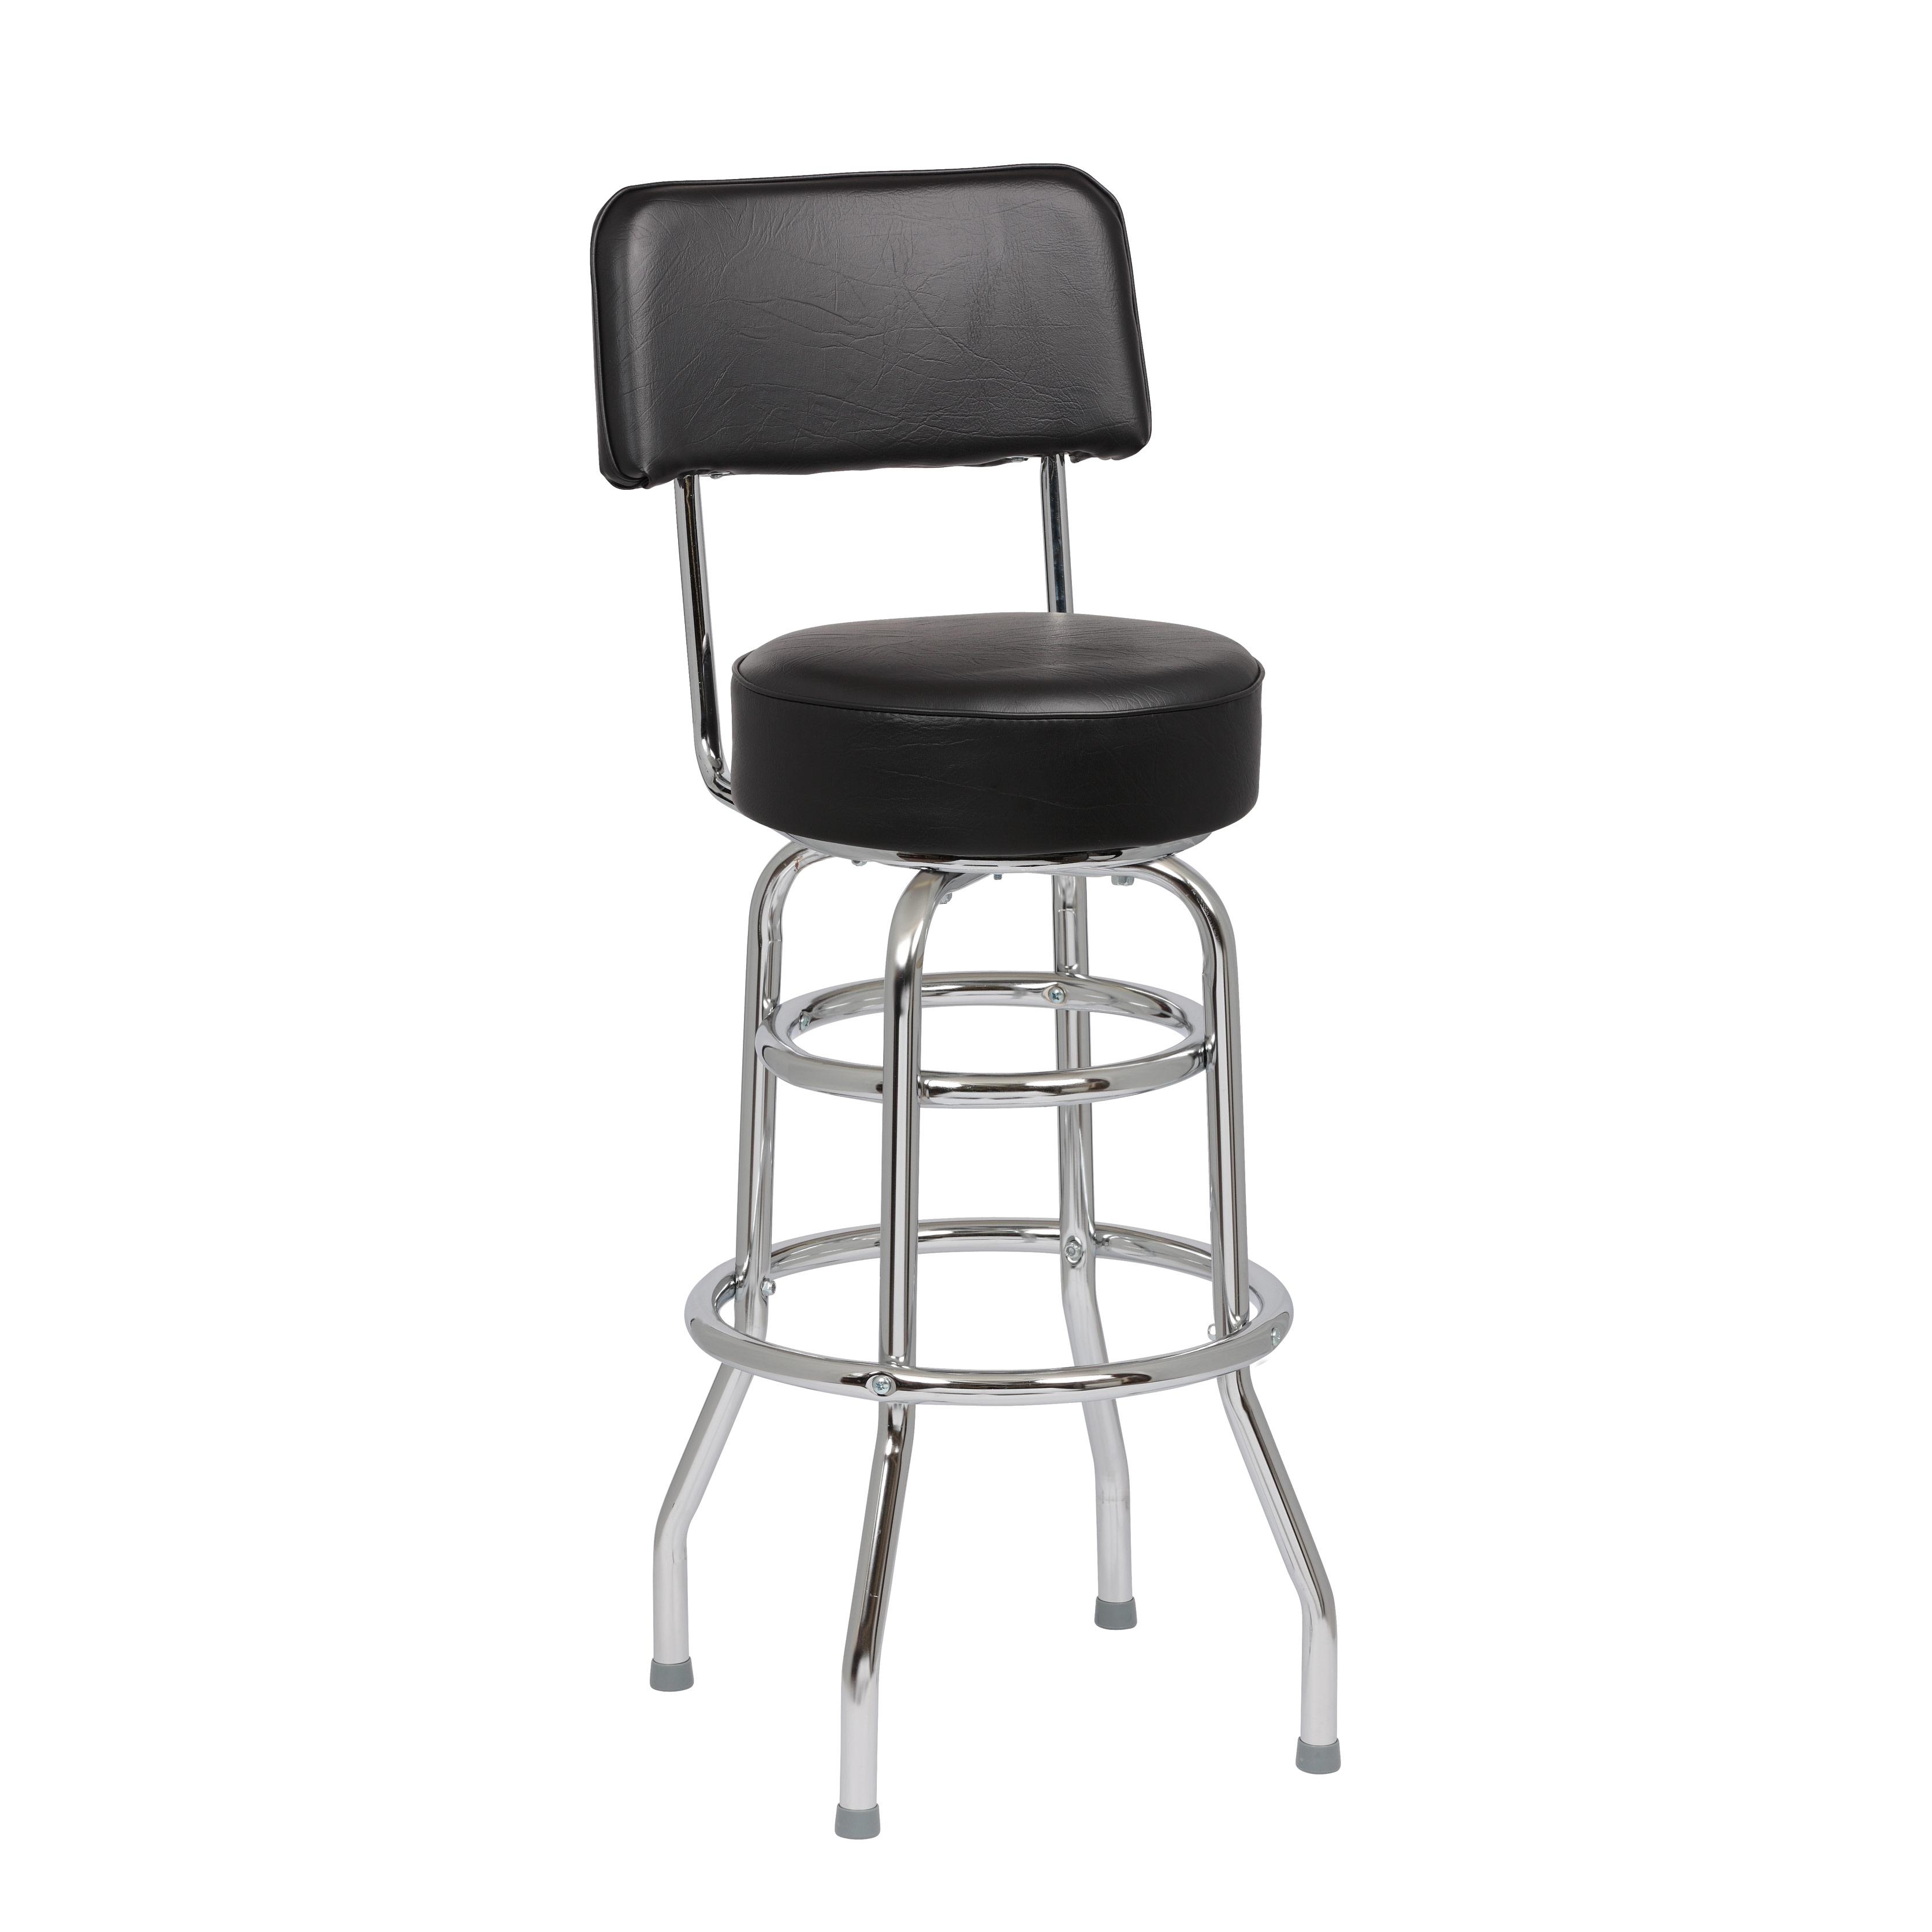 Royal Industries ROY 7716 B bar stool, swivel, indoor